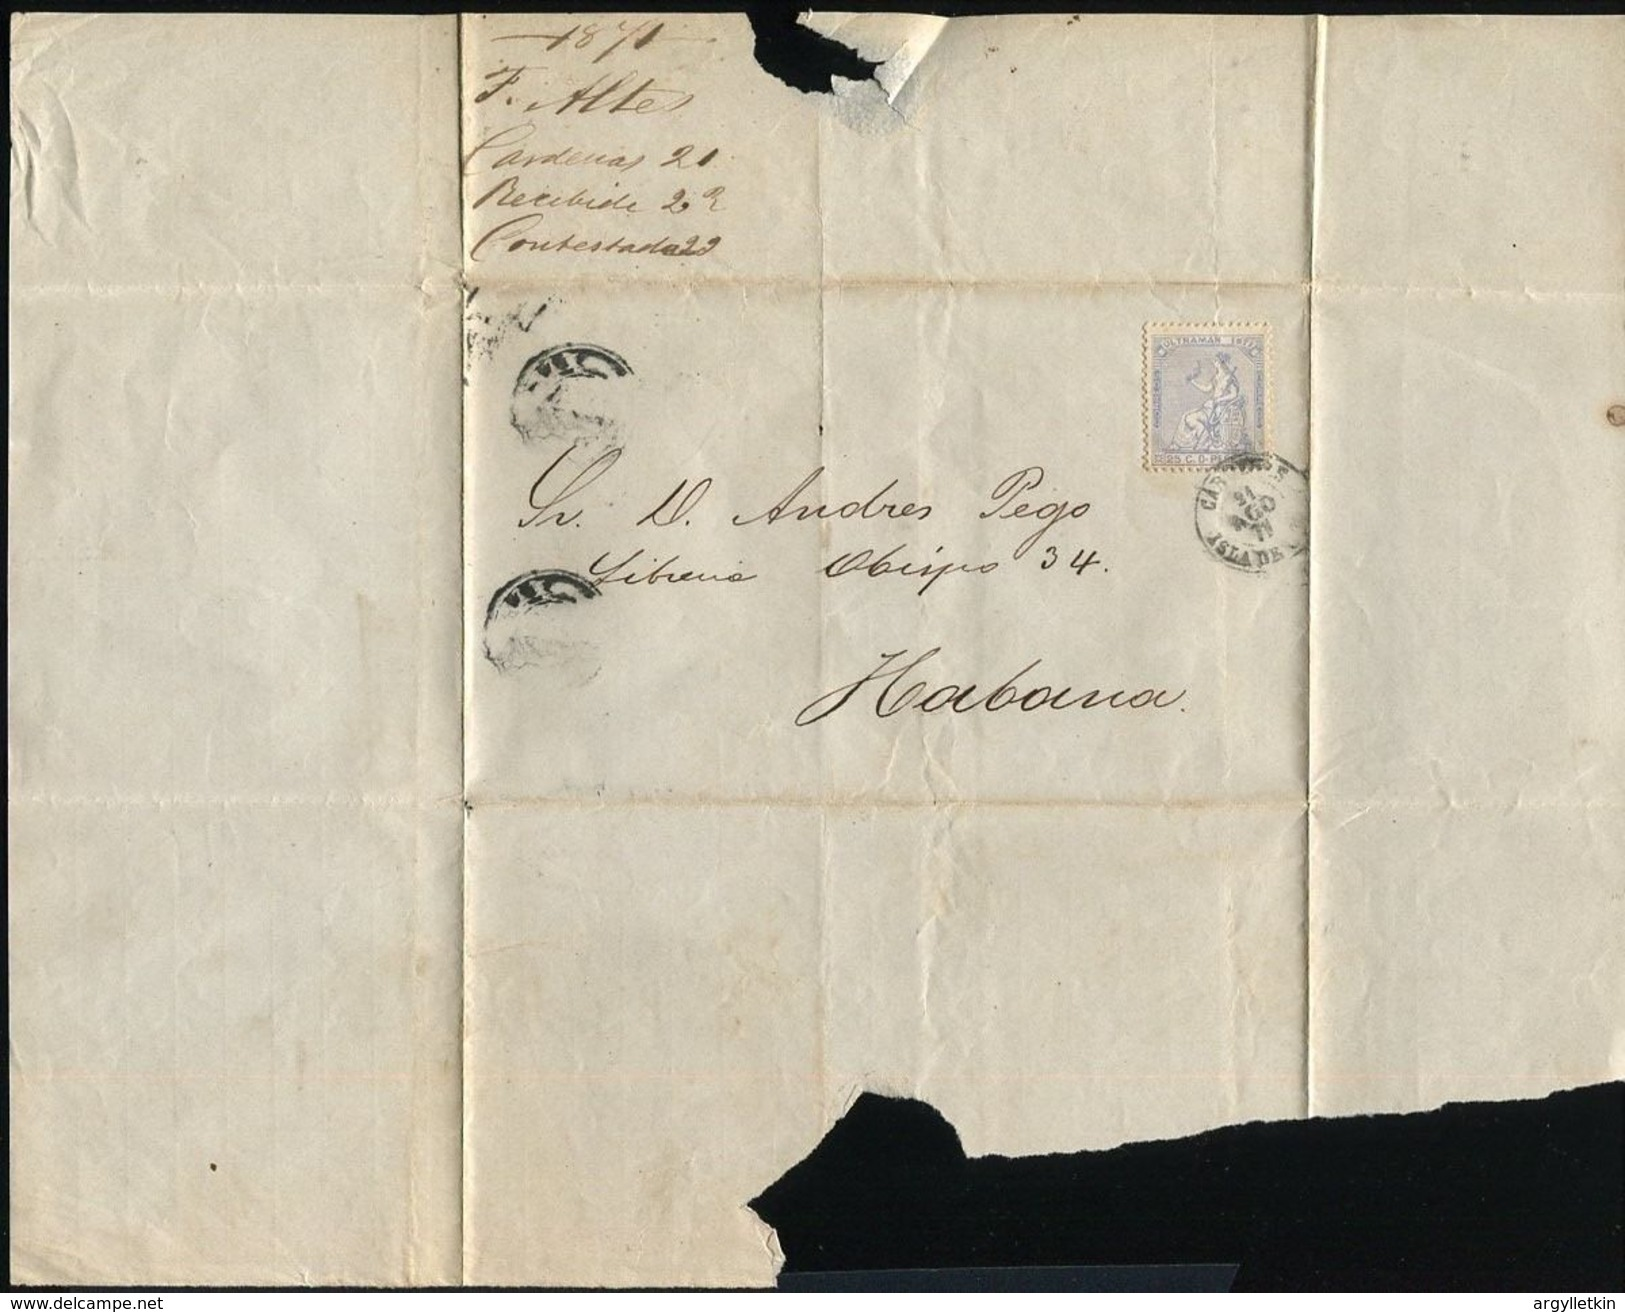 1871 CARDENAS ISLAND TO HAVANA SPANISH ANTILLES - Stamps